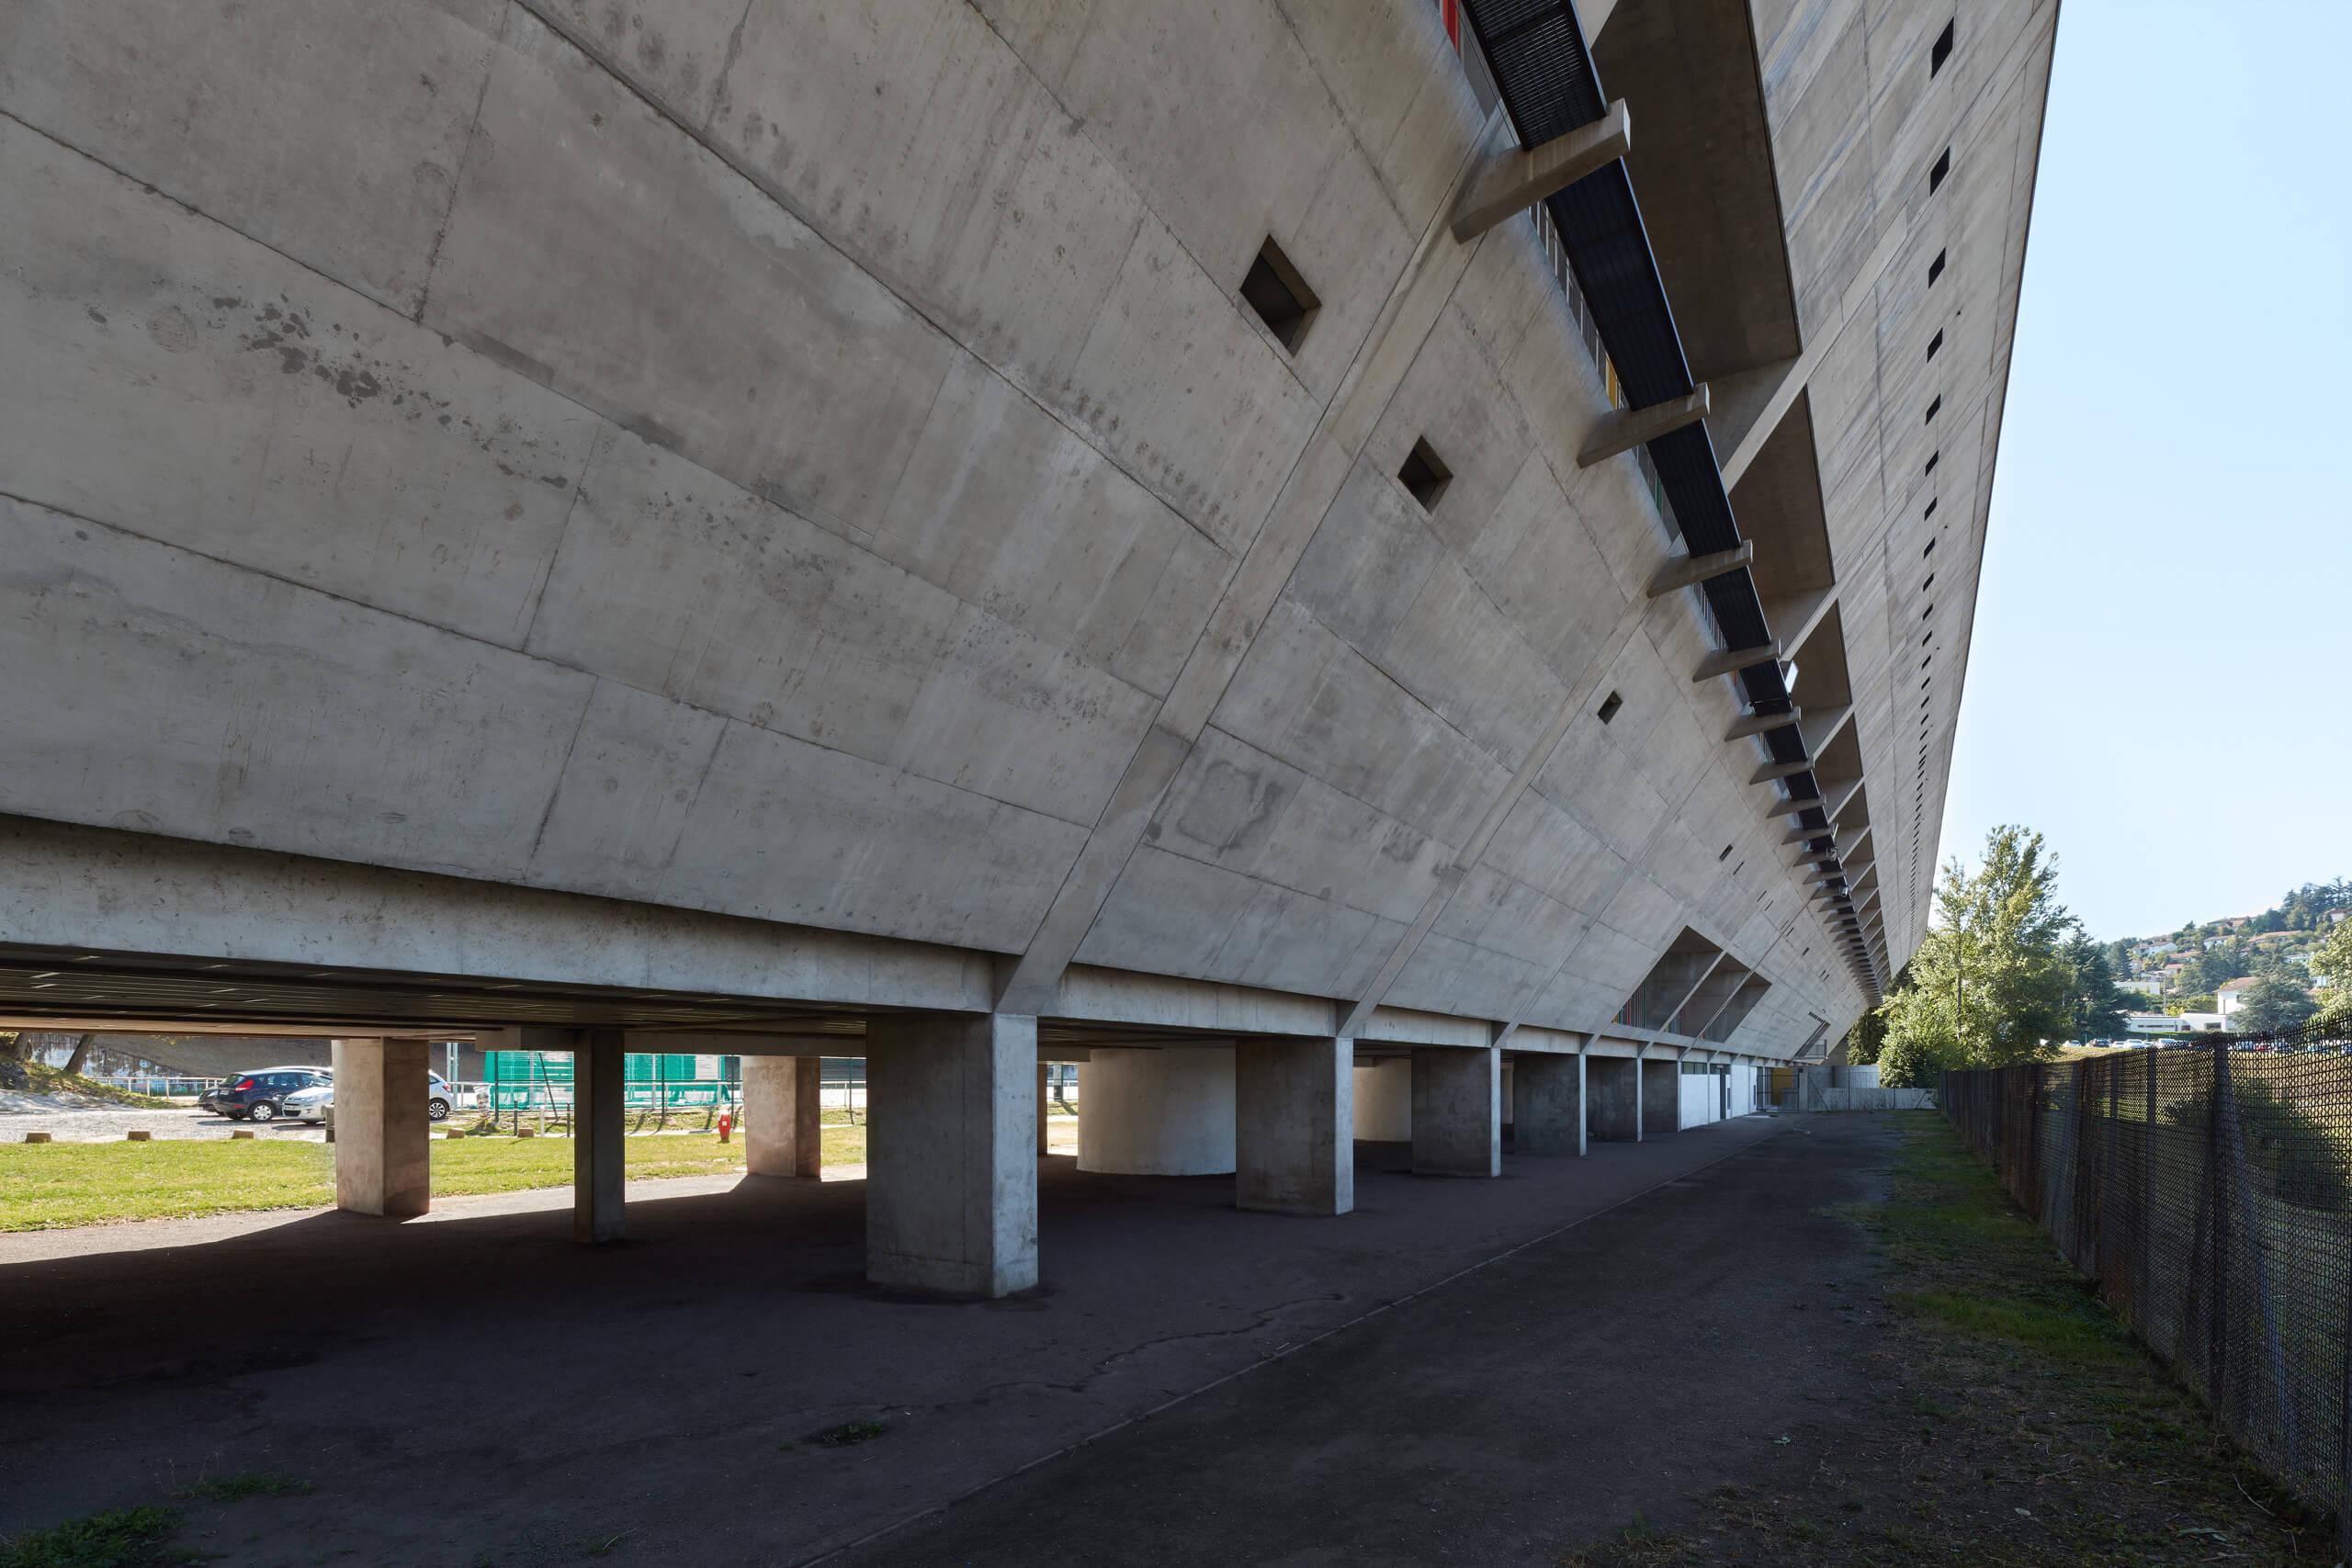 Federico_Covre_Le_Corbusier_Stadium_Firminy_2018_39